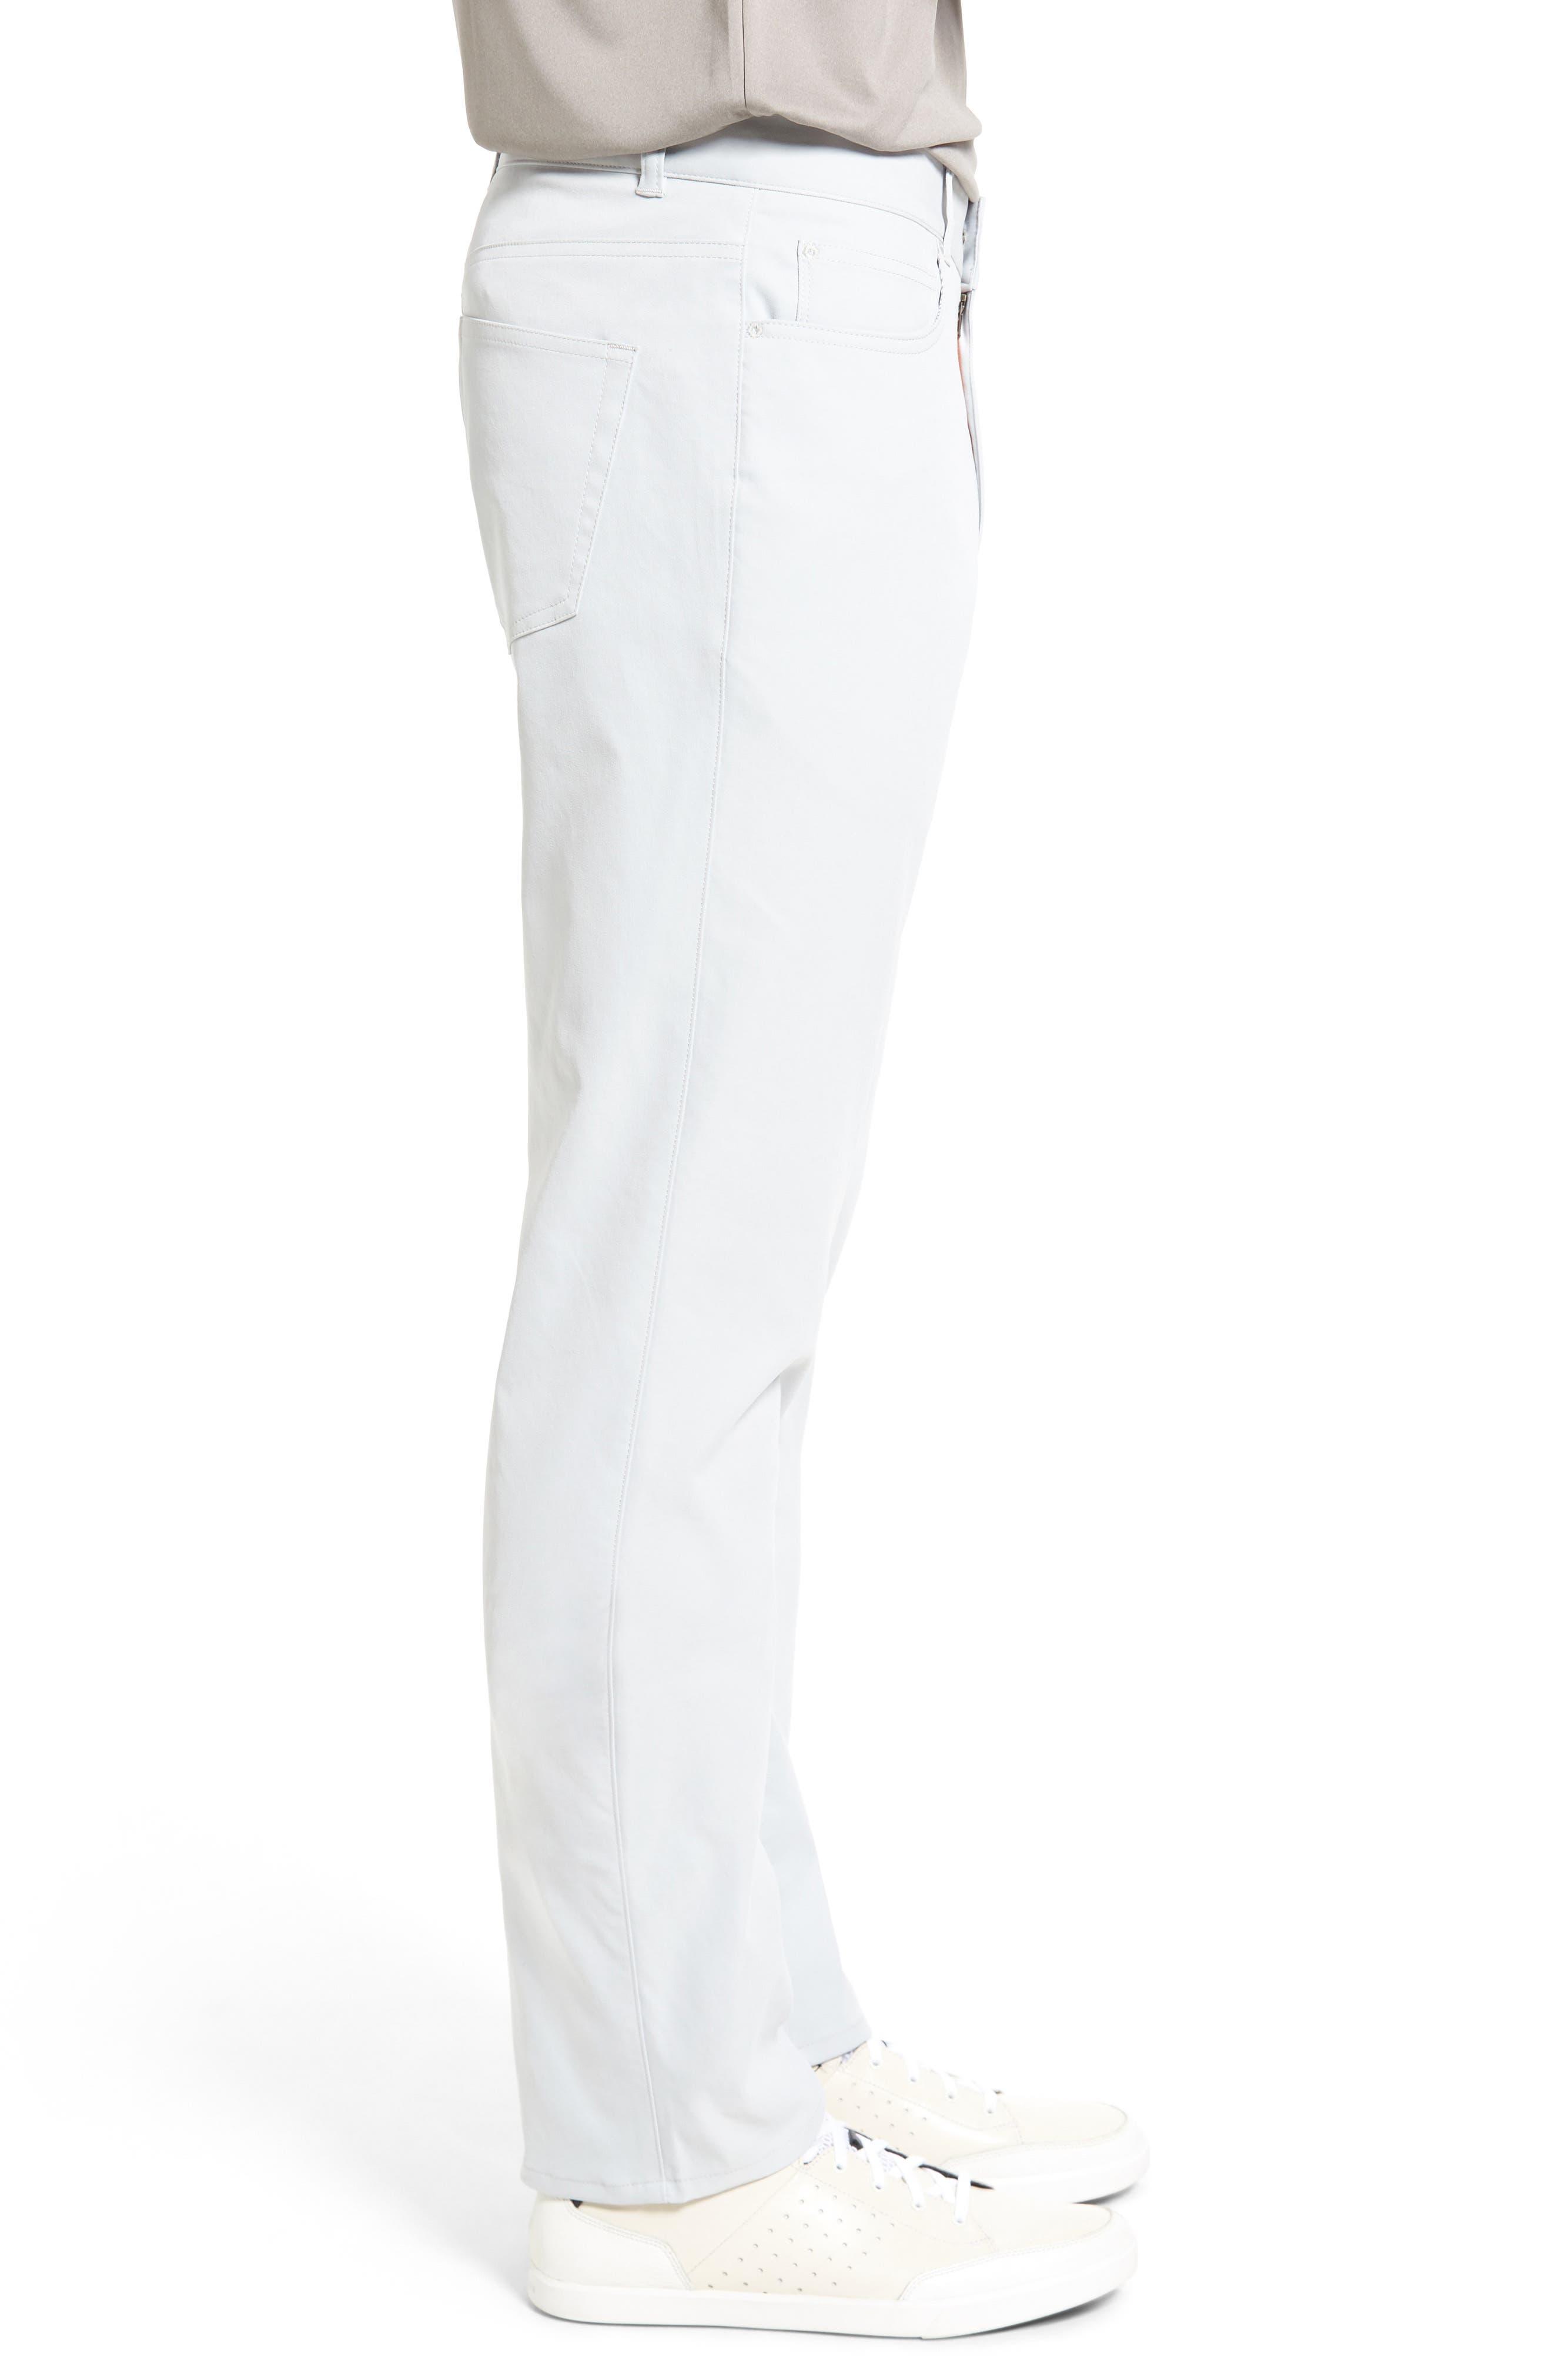 Alternate Image 3  - Peter Millar EB66 Performance Pants (Regular & Big)